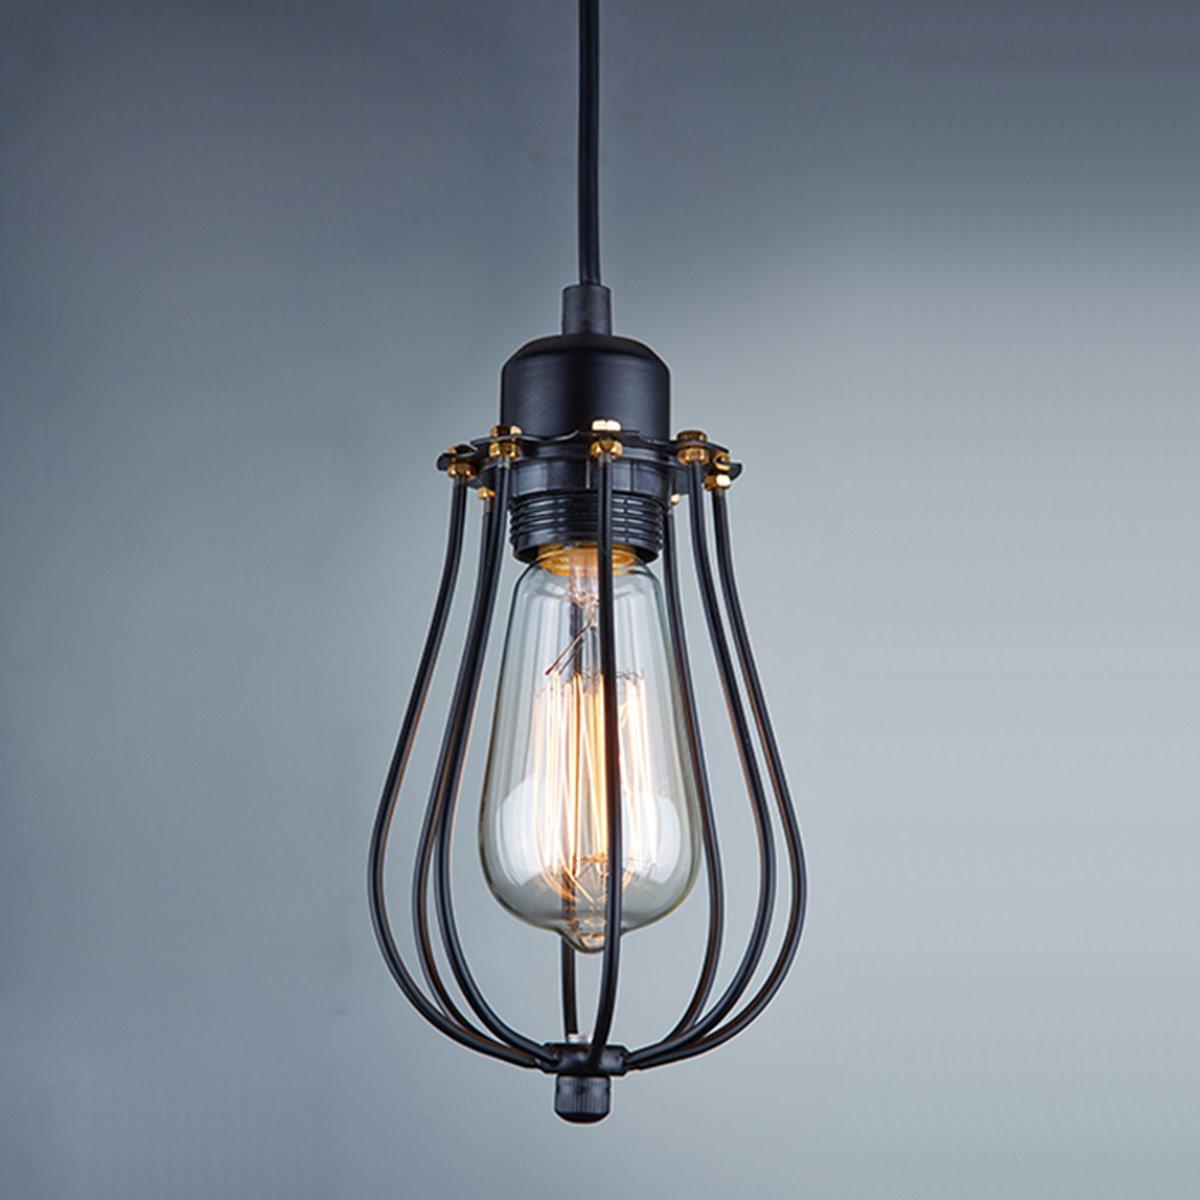 Ecopower Vintage Style Industrial Hanging Light Black Mini Pendant ...